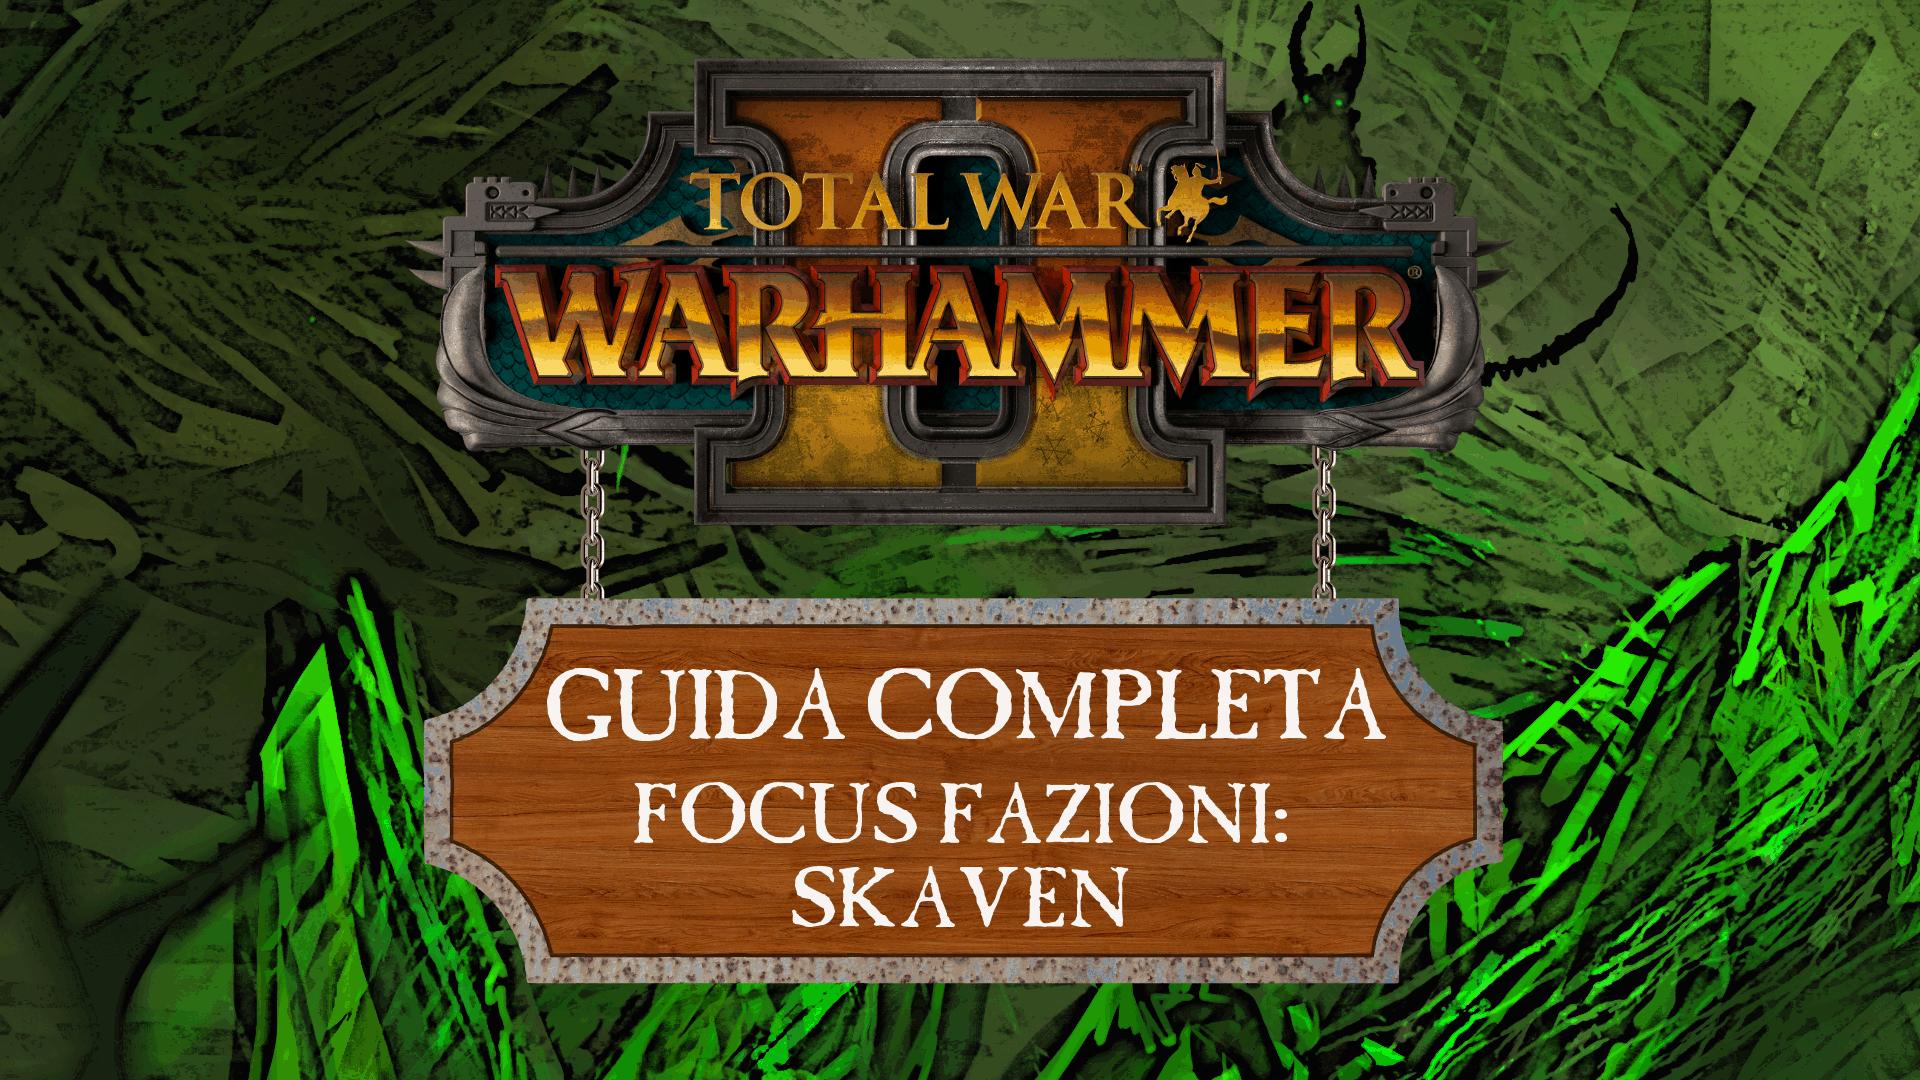 Guida a Total War: Warhammer II – Skaven